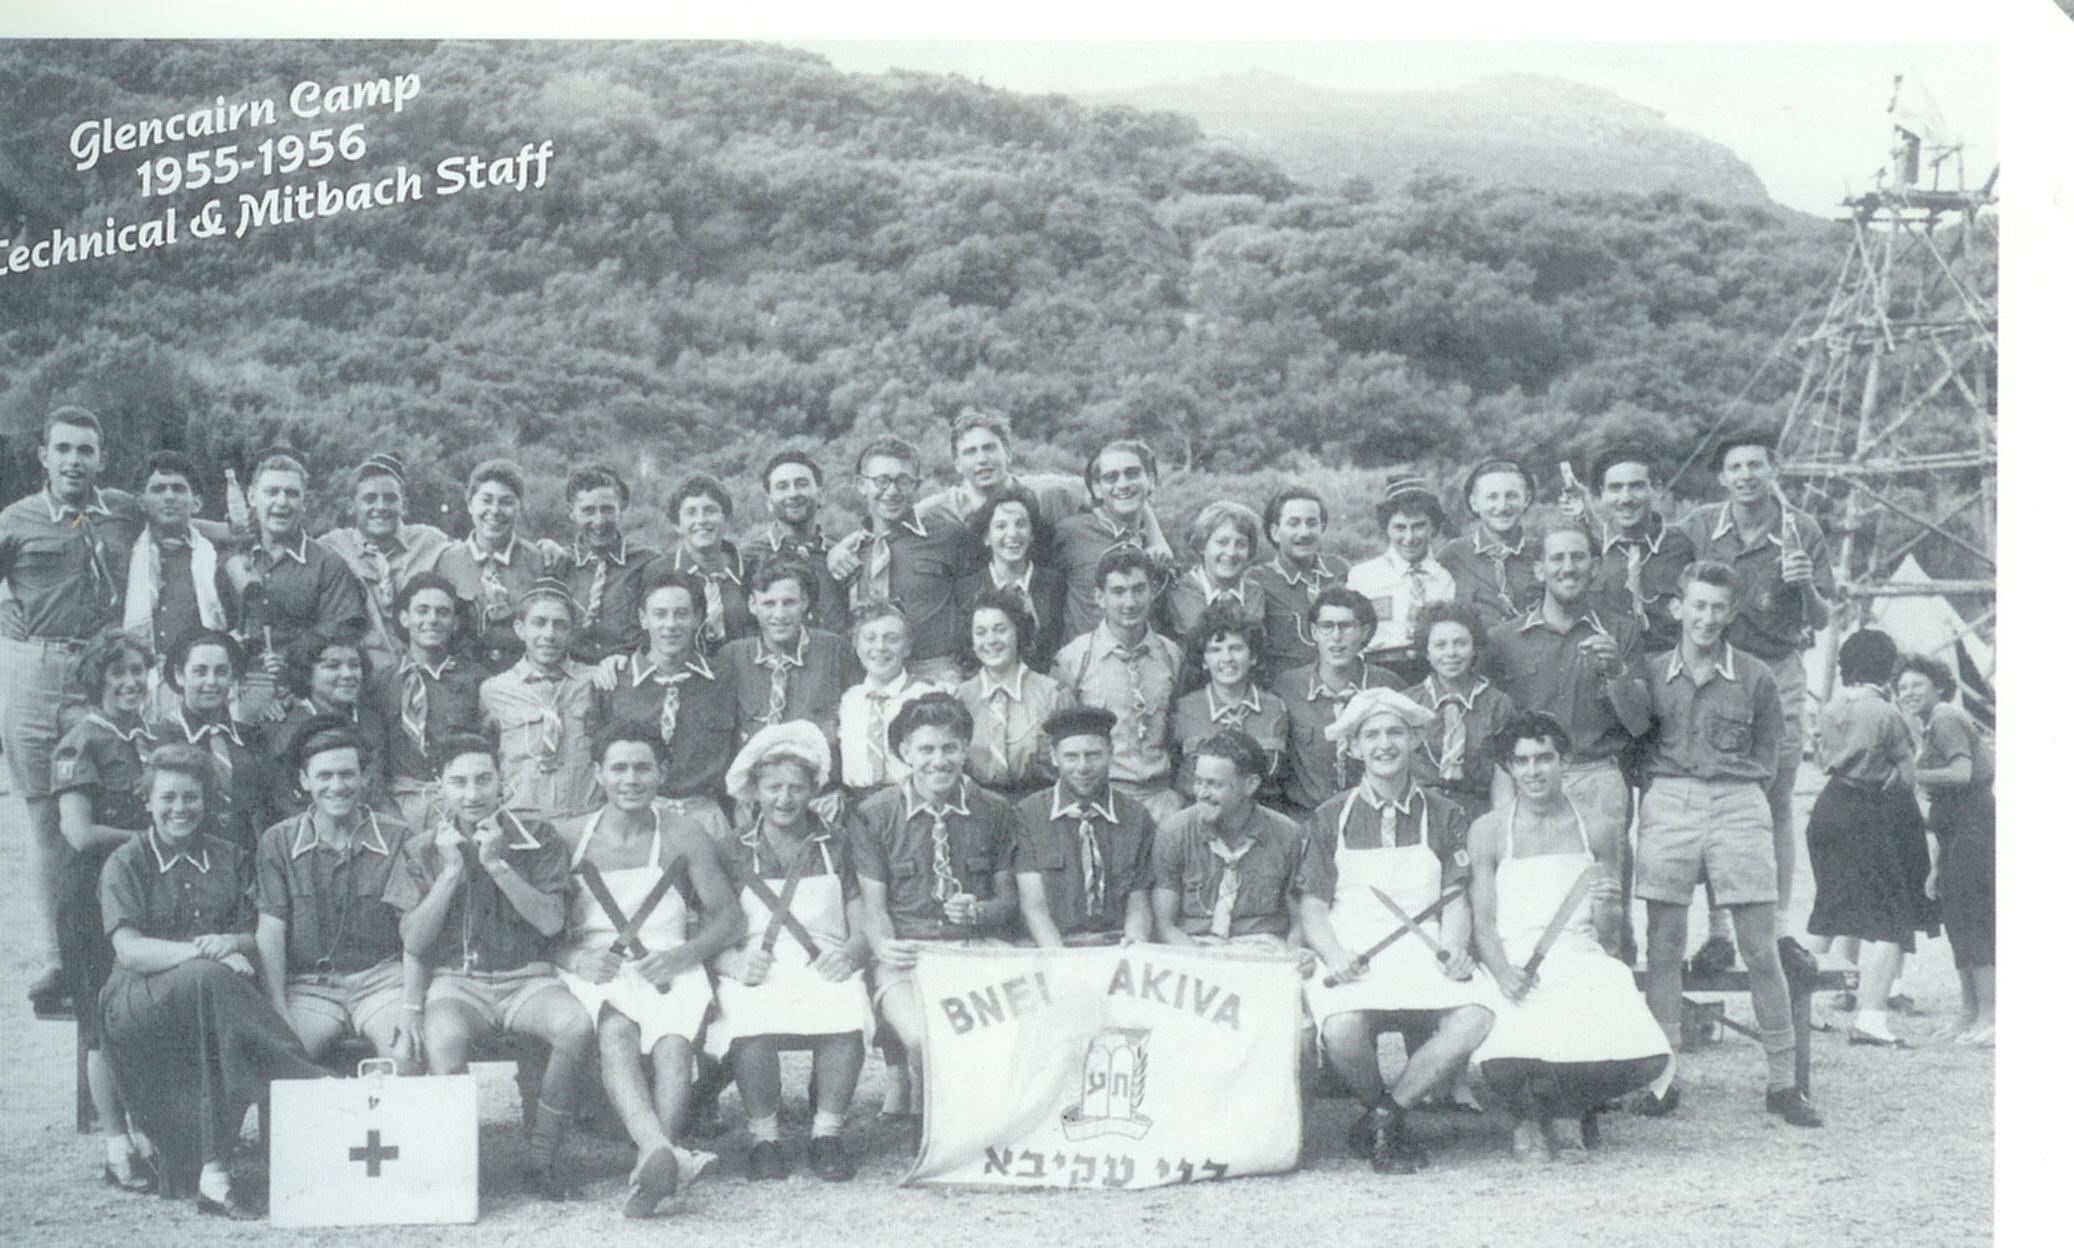 Glencairn 1955 Technical Staff